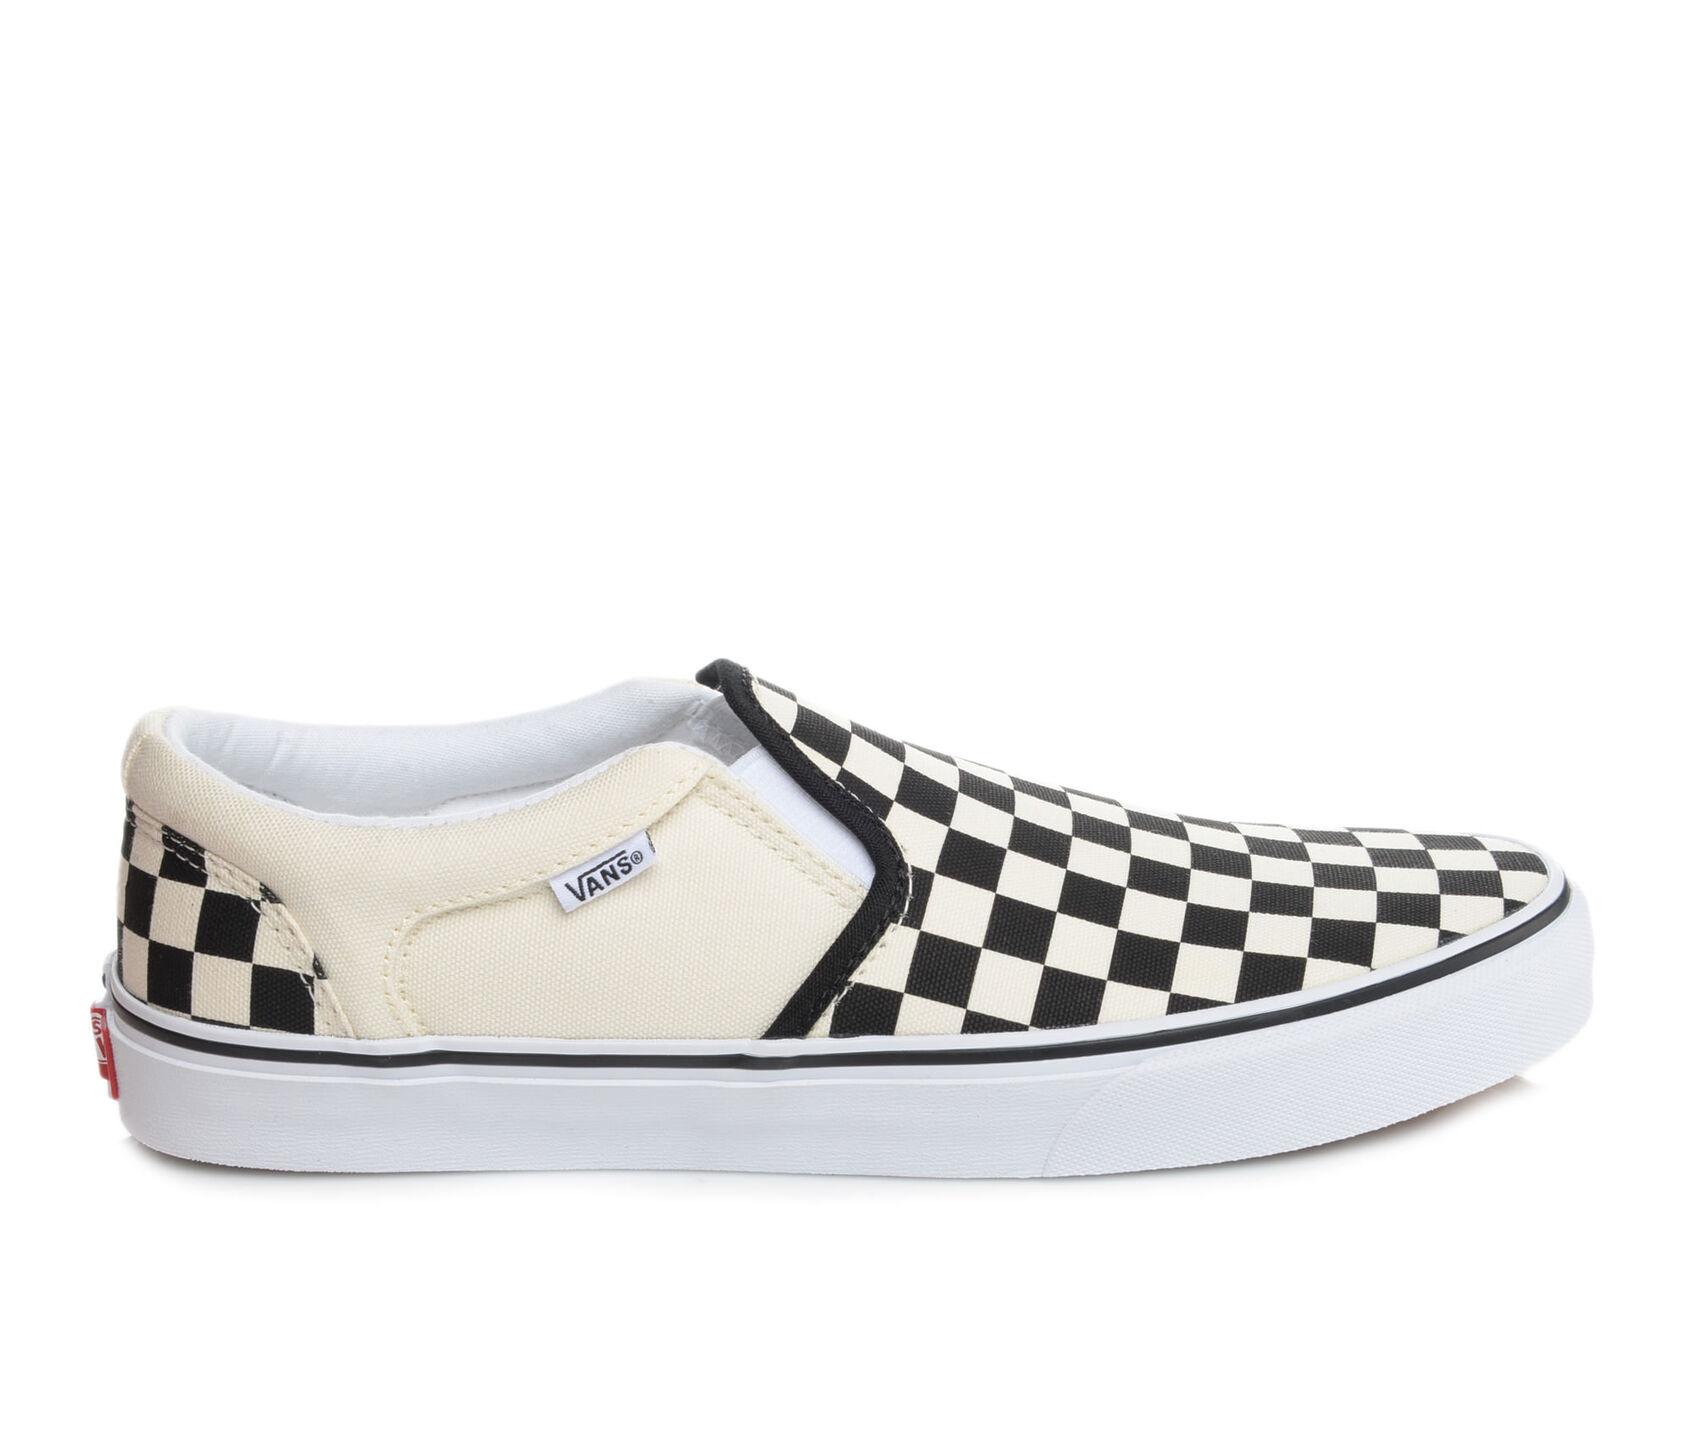 f8386c3fee9 ... Vans Asher Slip-On Skate Shoes. Previous